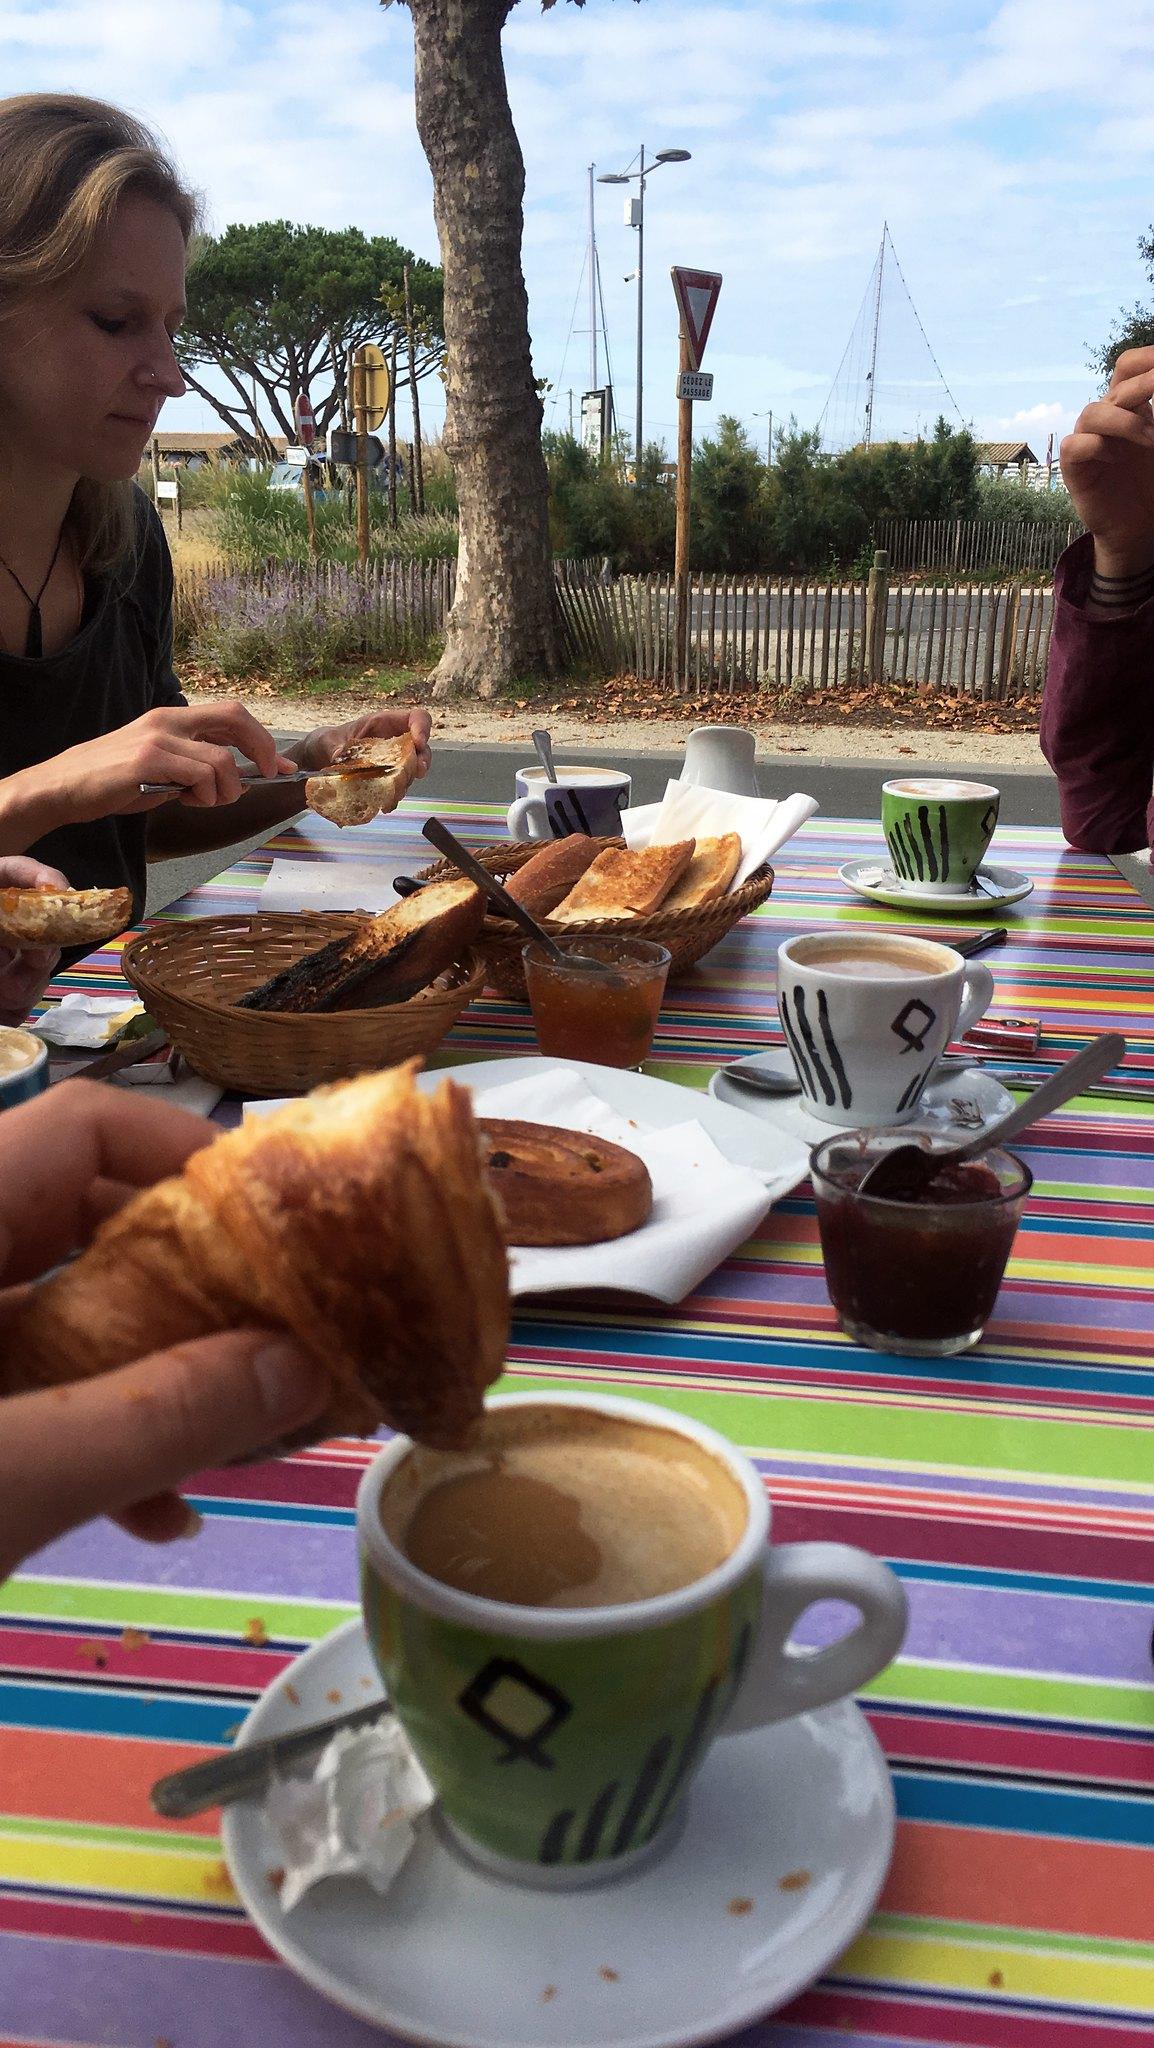 Petit Déjeuner, Frühstücken in Andernos-les-Bains